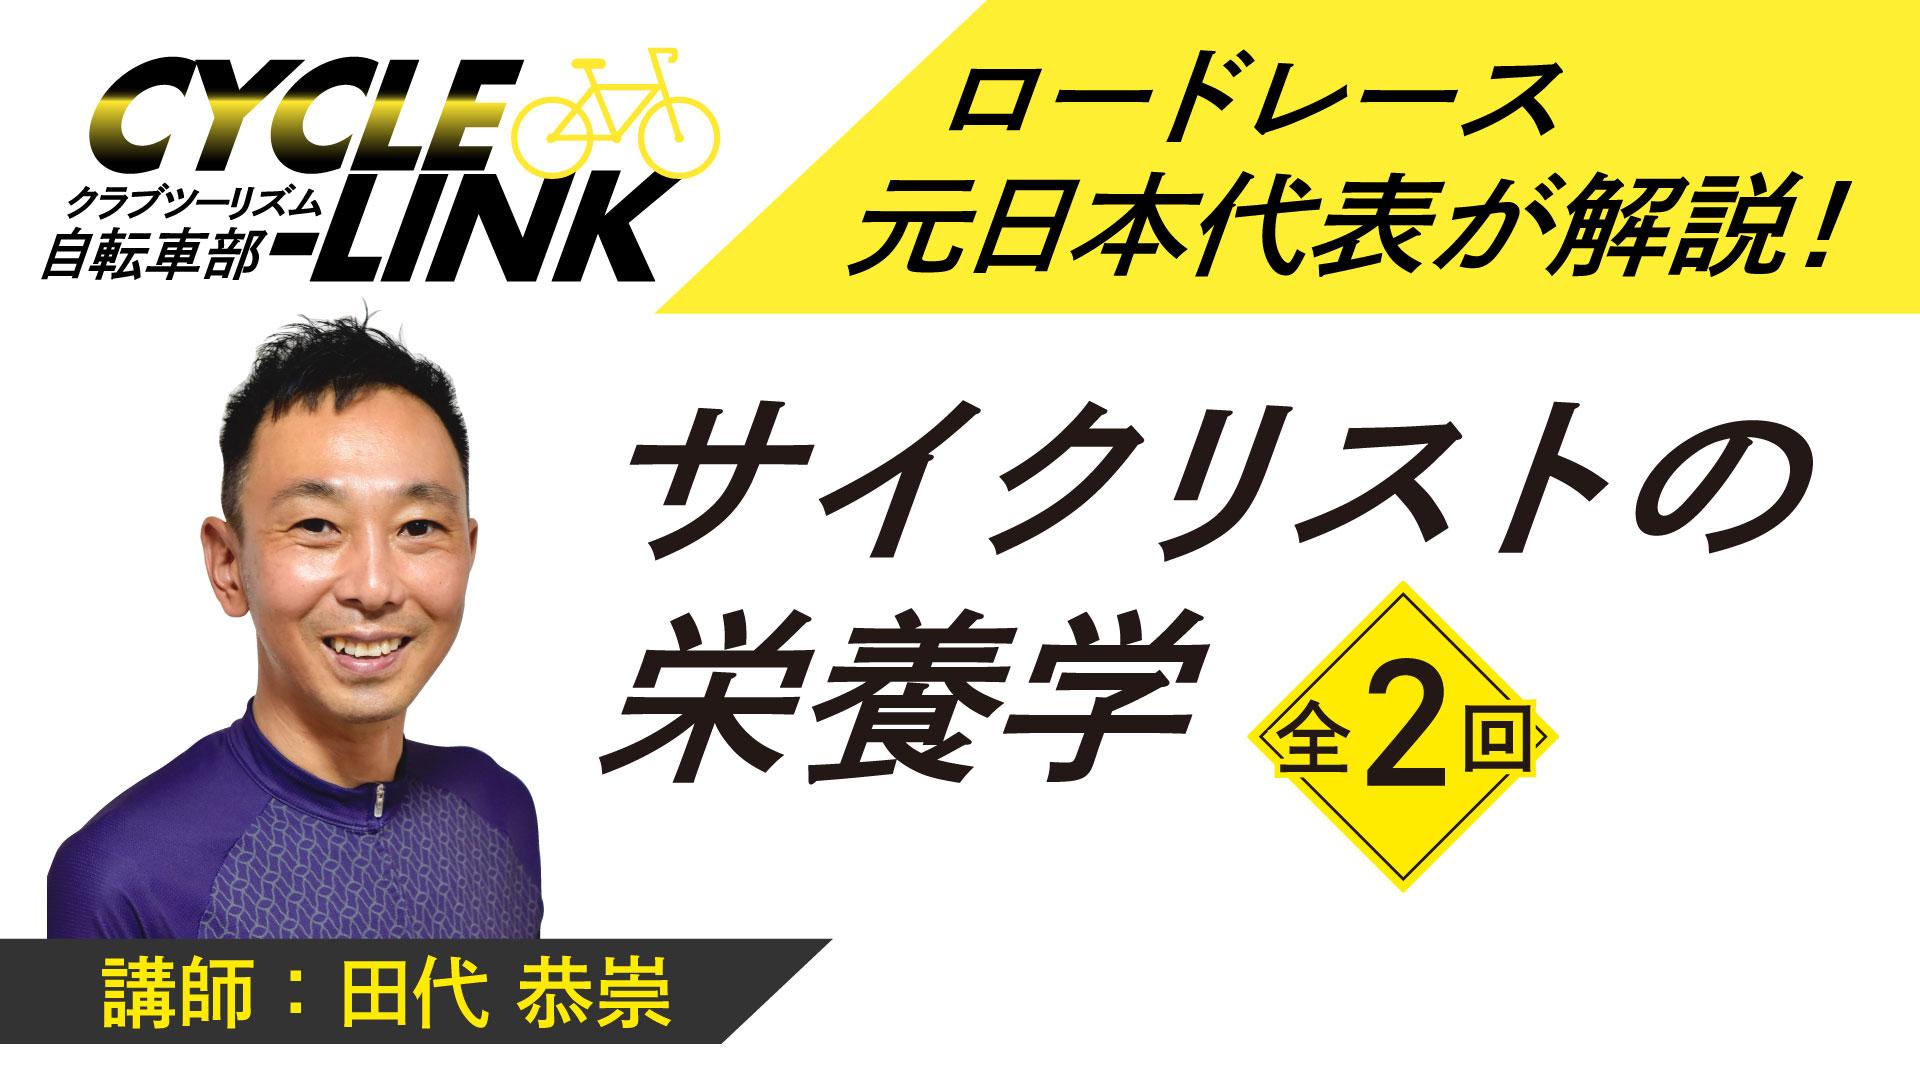 ★NEW★【自転車】サイクリストの栄養学